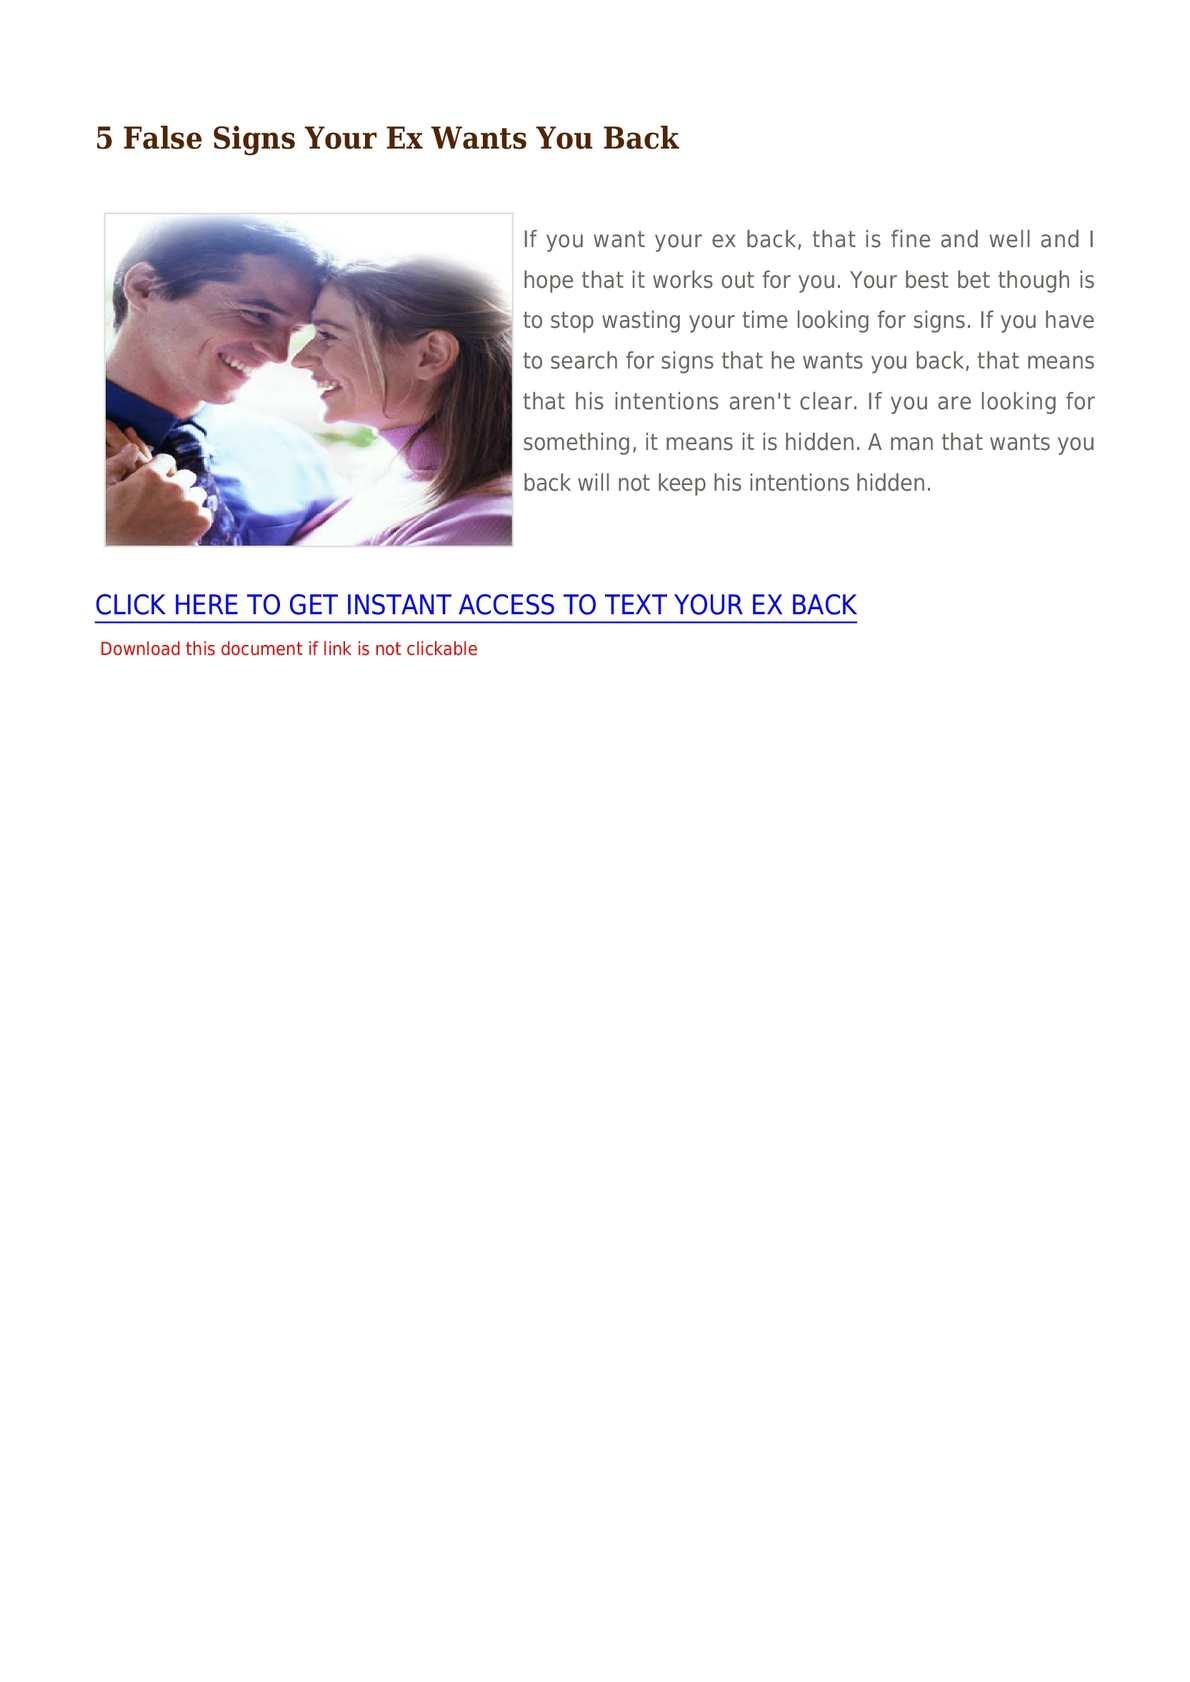 Calaméo - 5 False Signs Your Ex Wants You Back